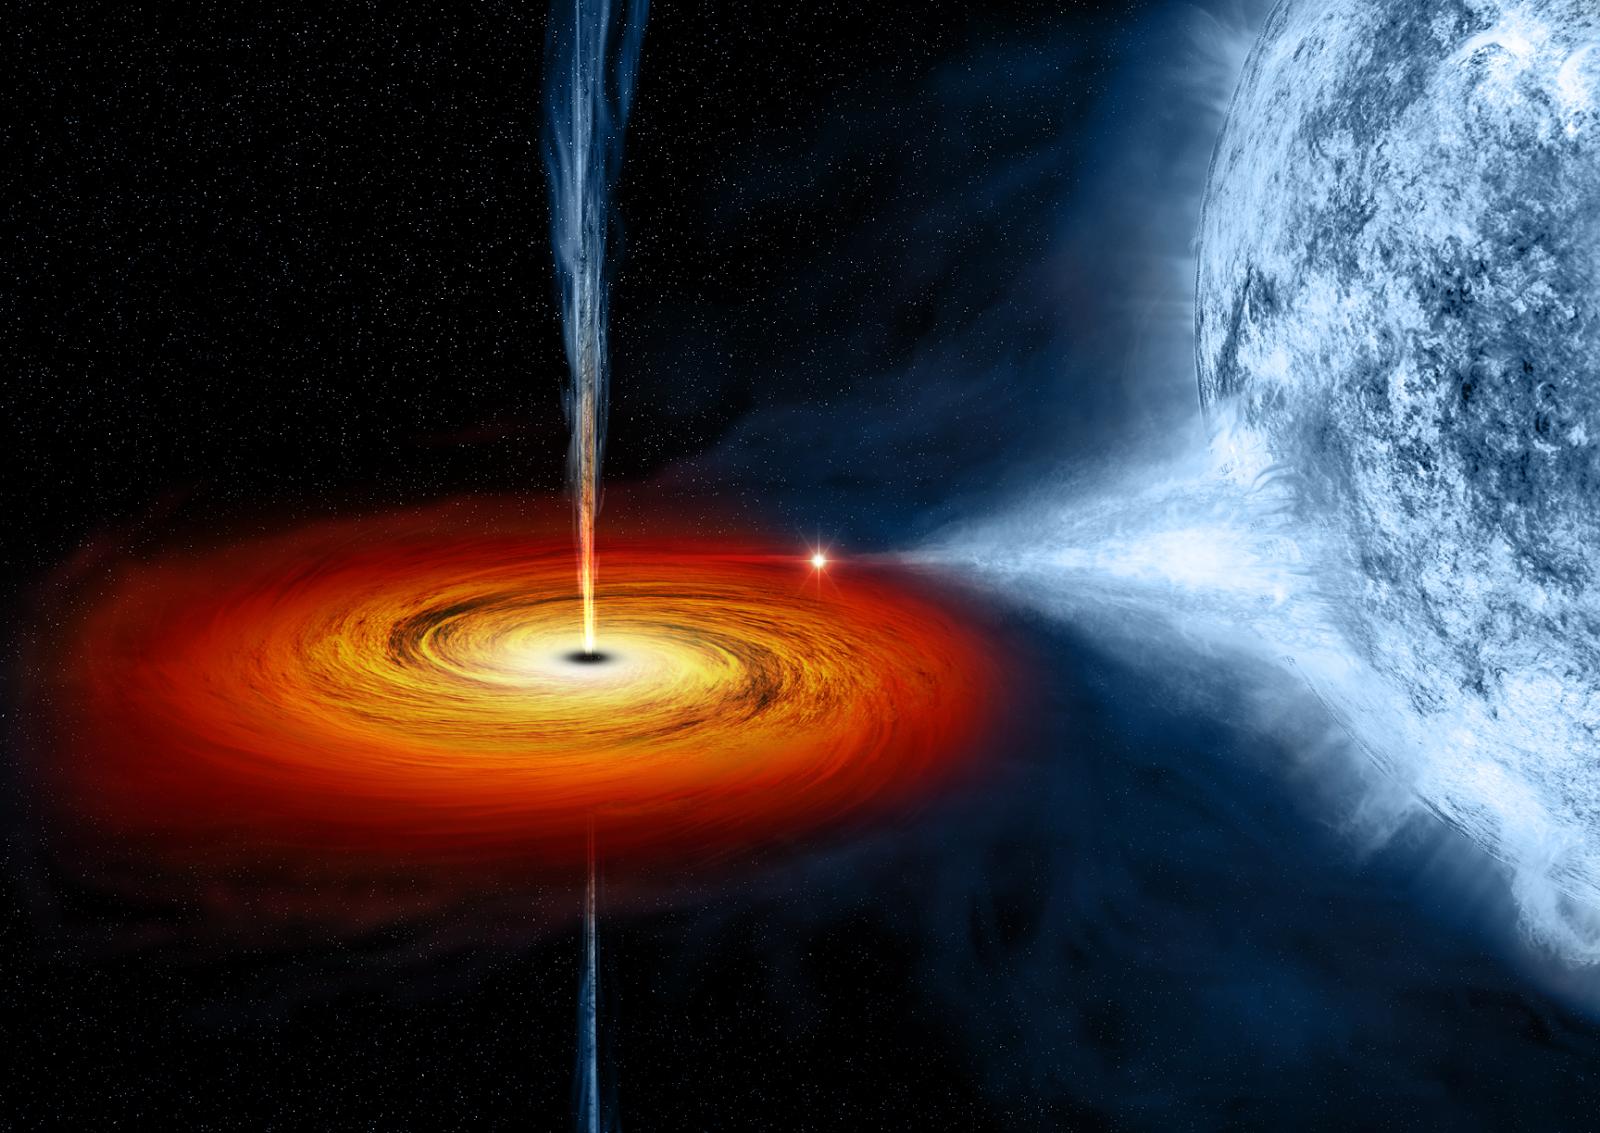 study-of-optical-properties-of-super-massive-black-hole